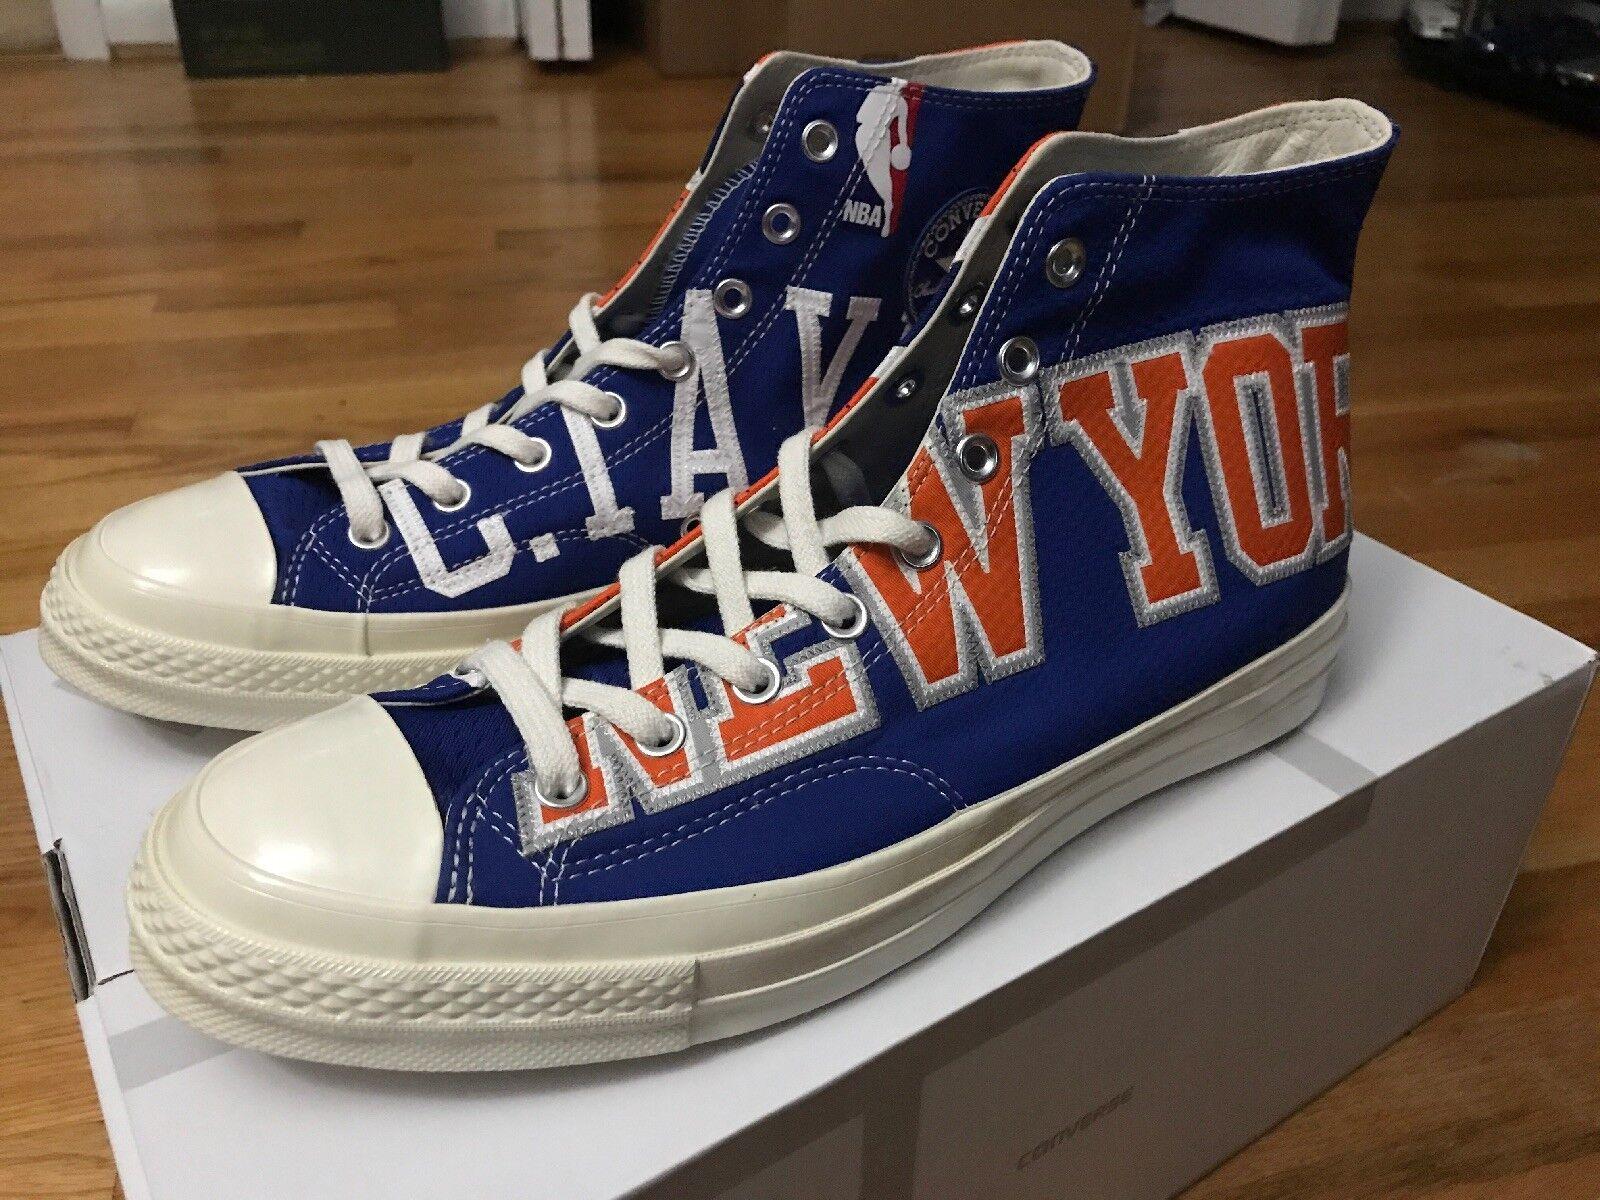 Converse Chuck Taylor All Star 70 New York Knicks Gameday Jersey High Top blu